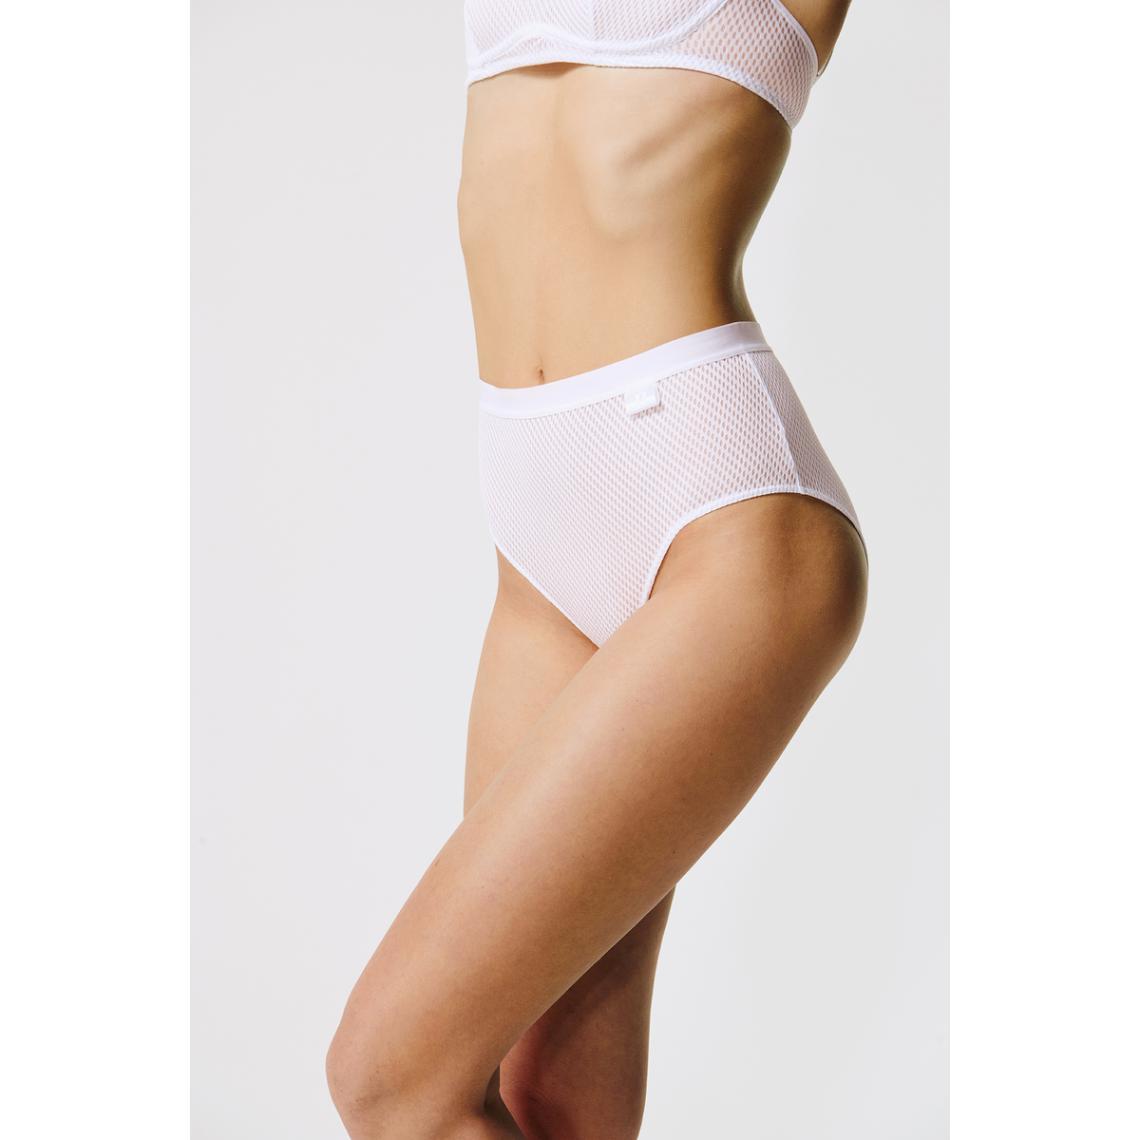 Culotte haute - Blanc Passionata - Passionata - Modalova